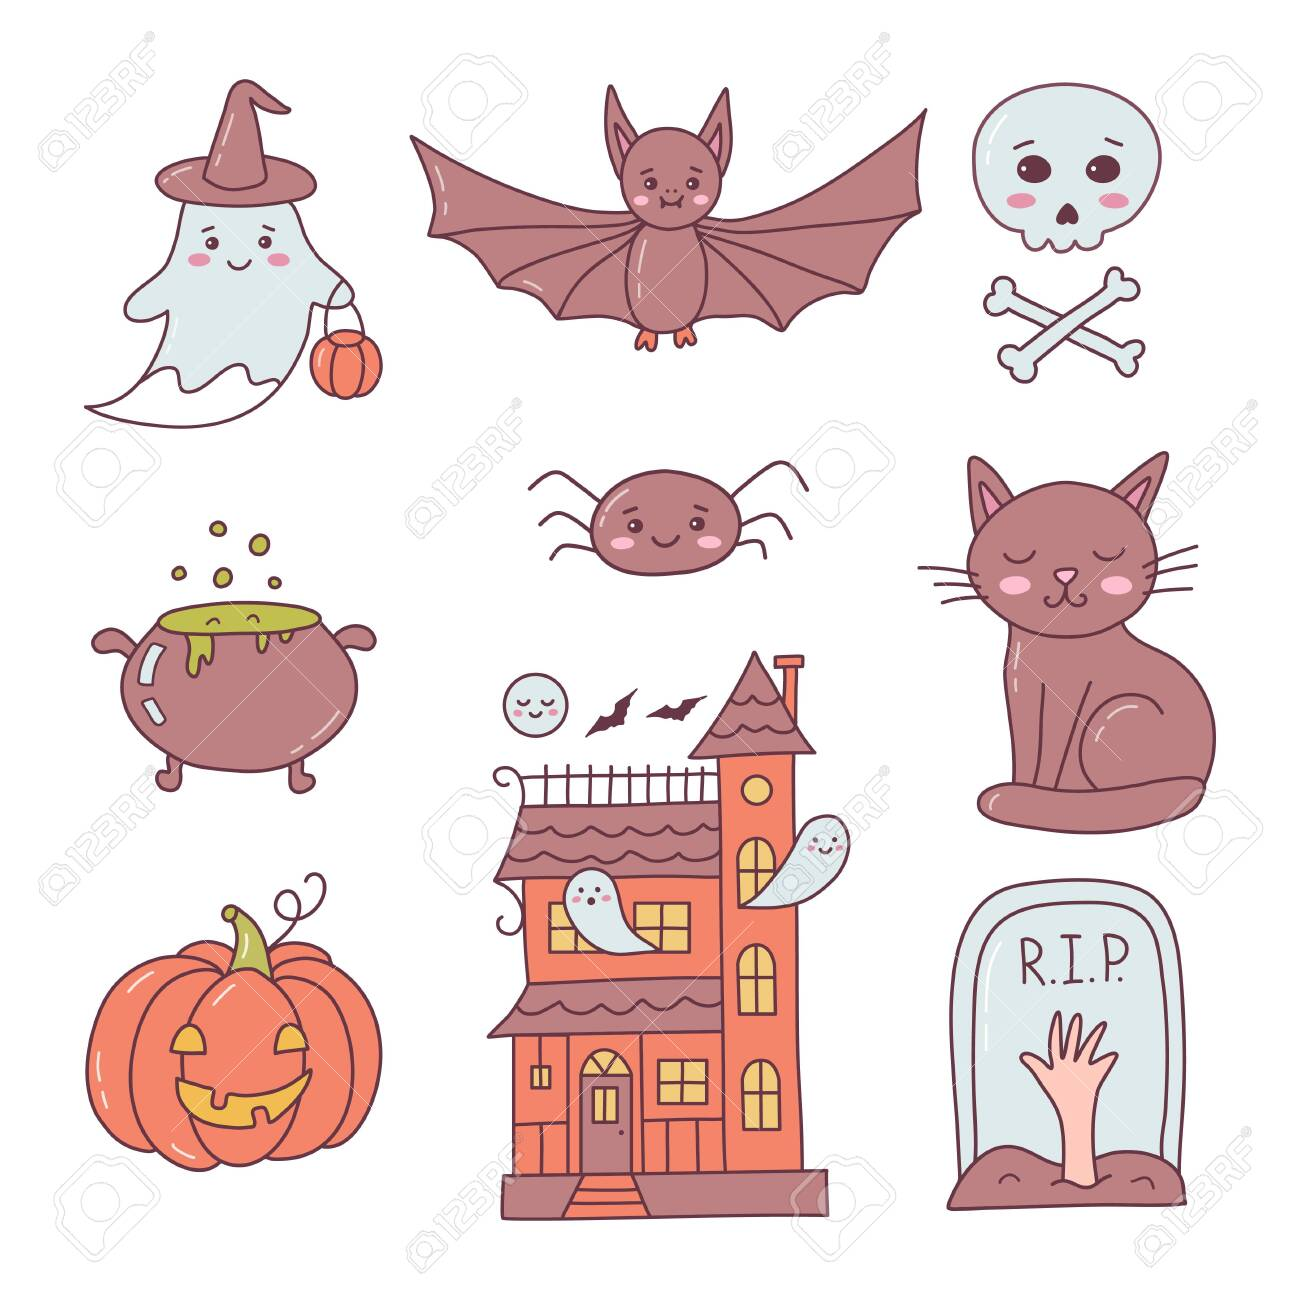 Happy Halloween icons collection.Cute cartoon hand drawn. Kawaii style. Vector illustration. - 157743164